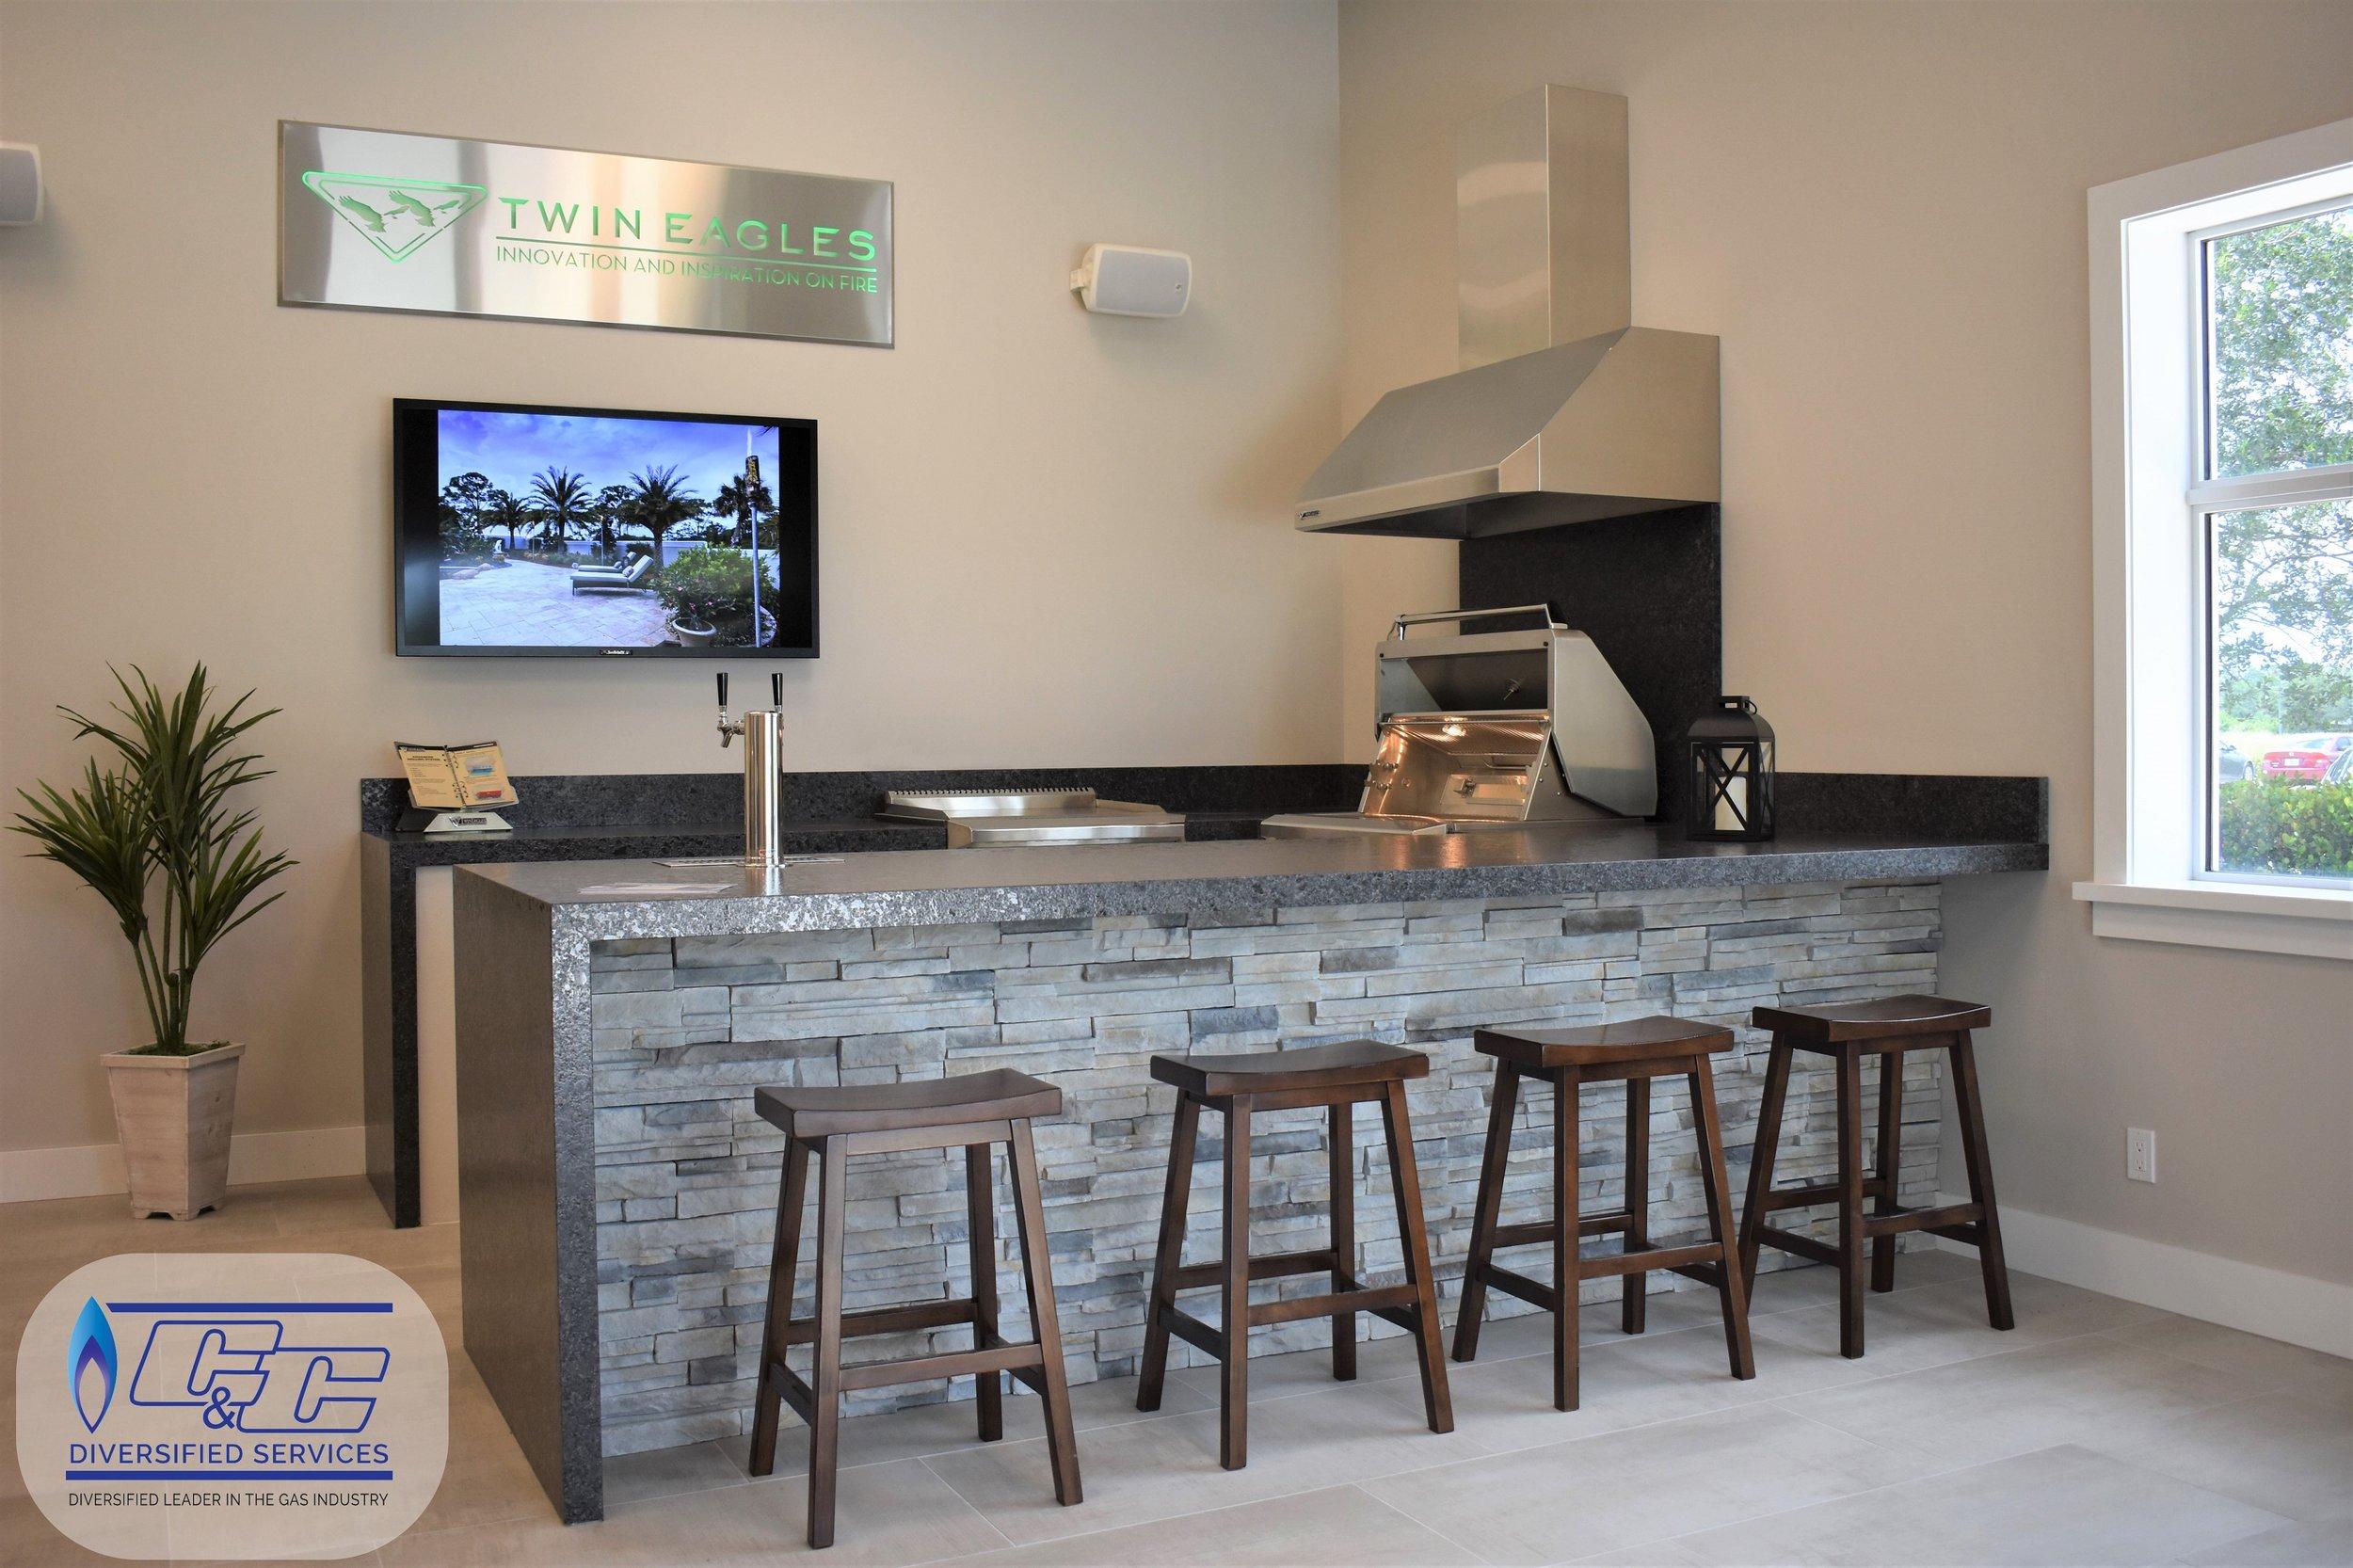 Custom Welded Aluminum Frame Outdoor Kitchen with Exquisite Features